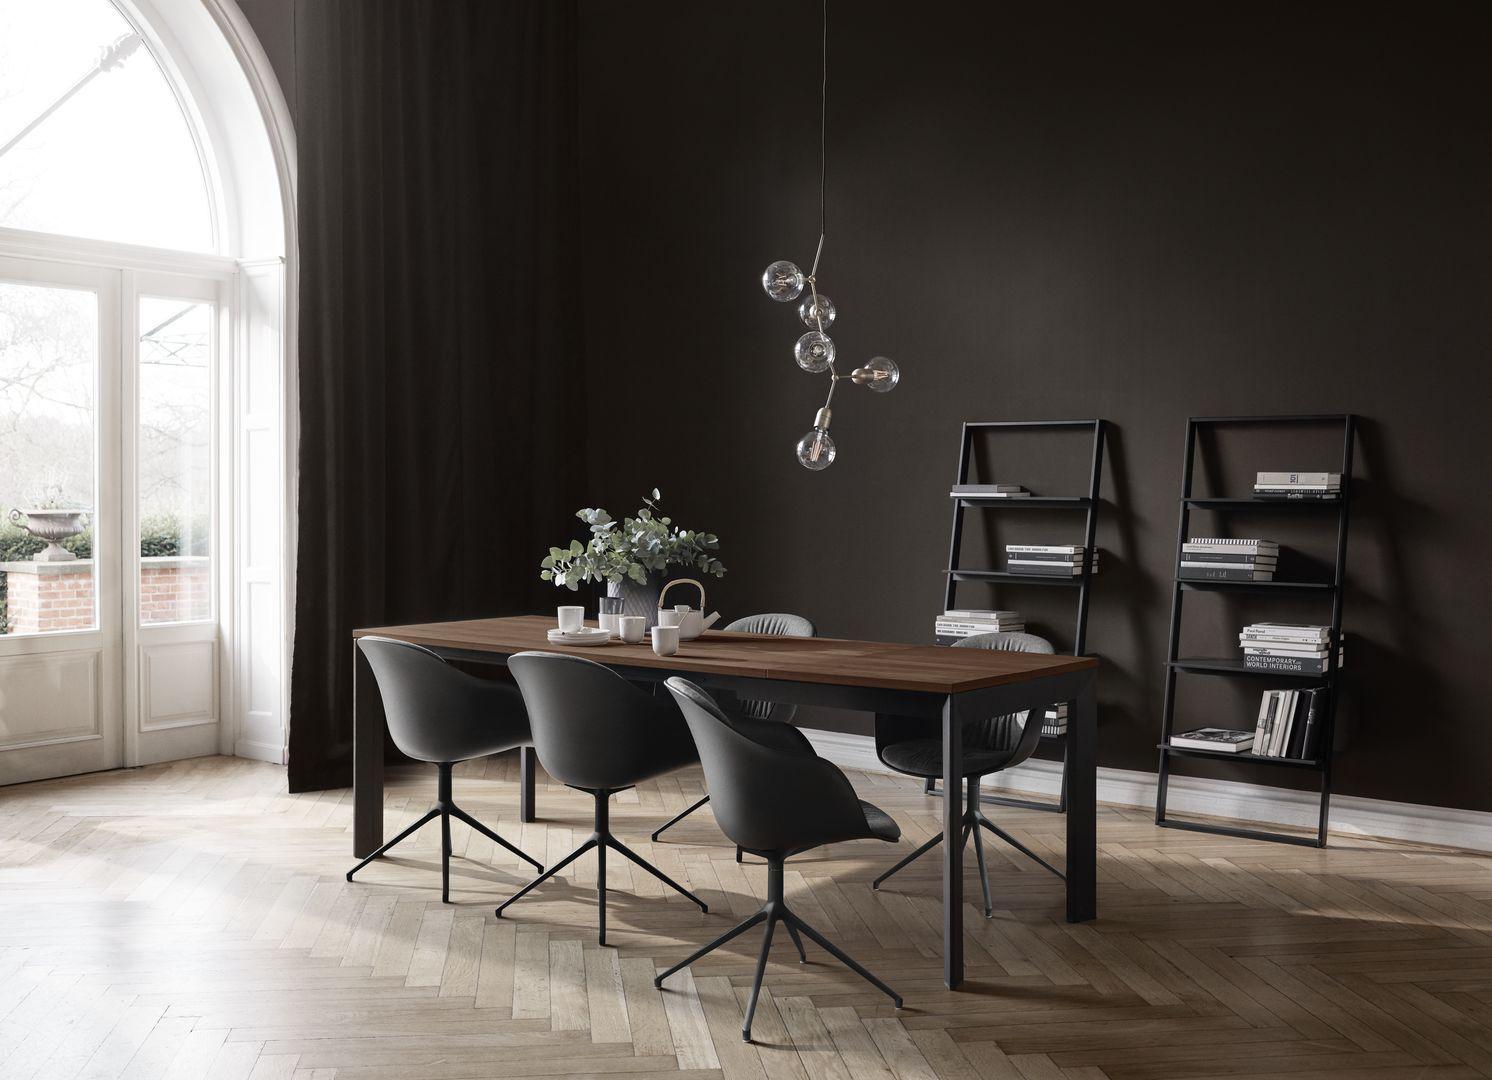 Designing A Room Dining Room Design Danish Dining Table Interior